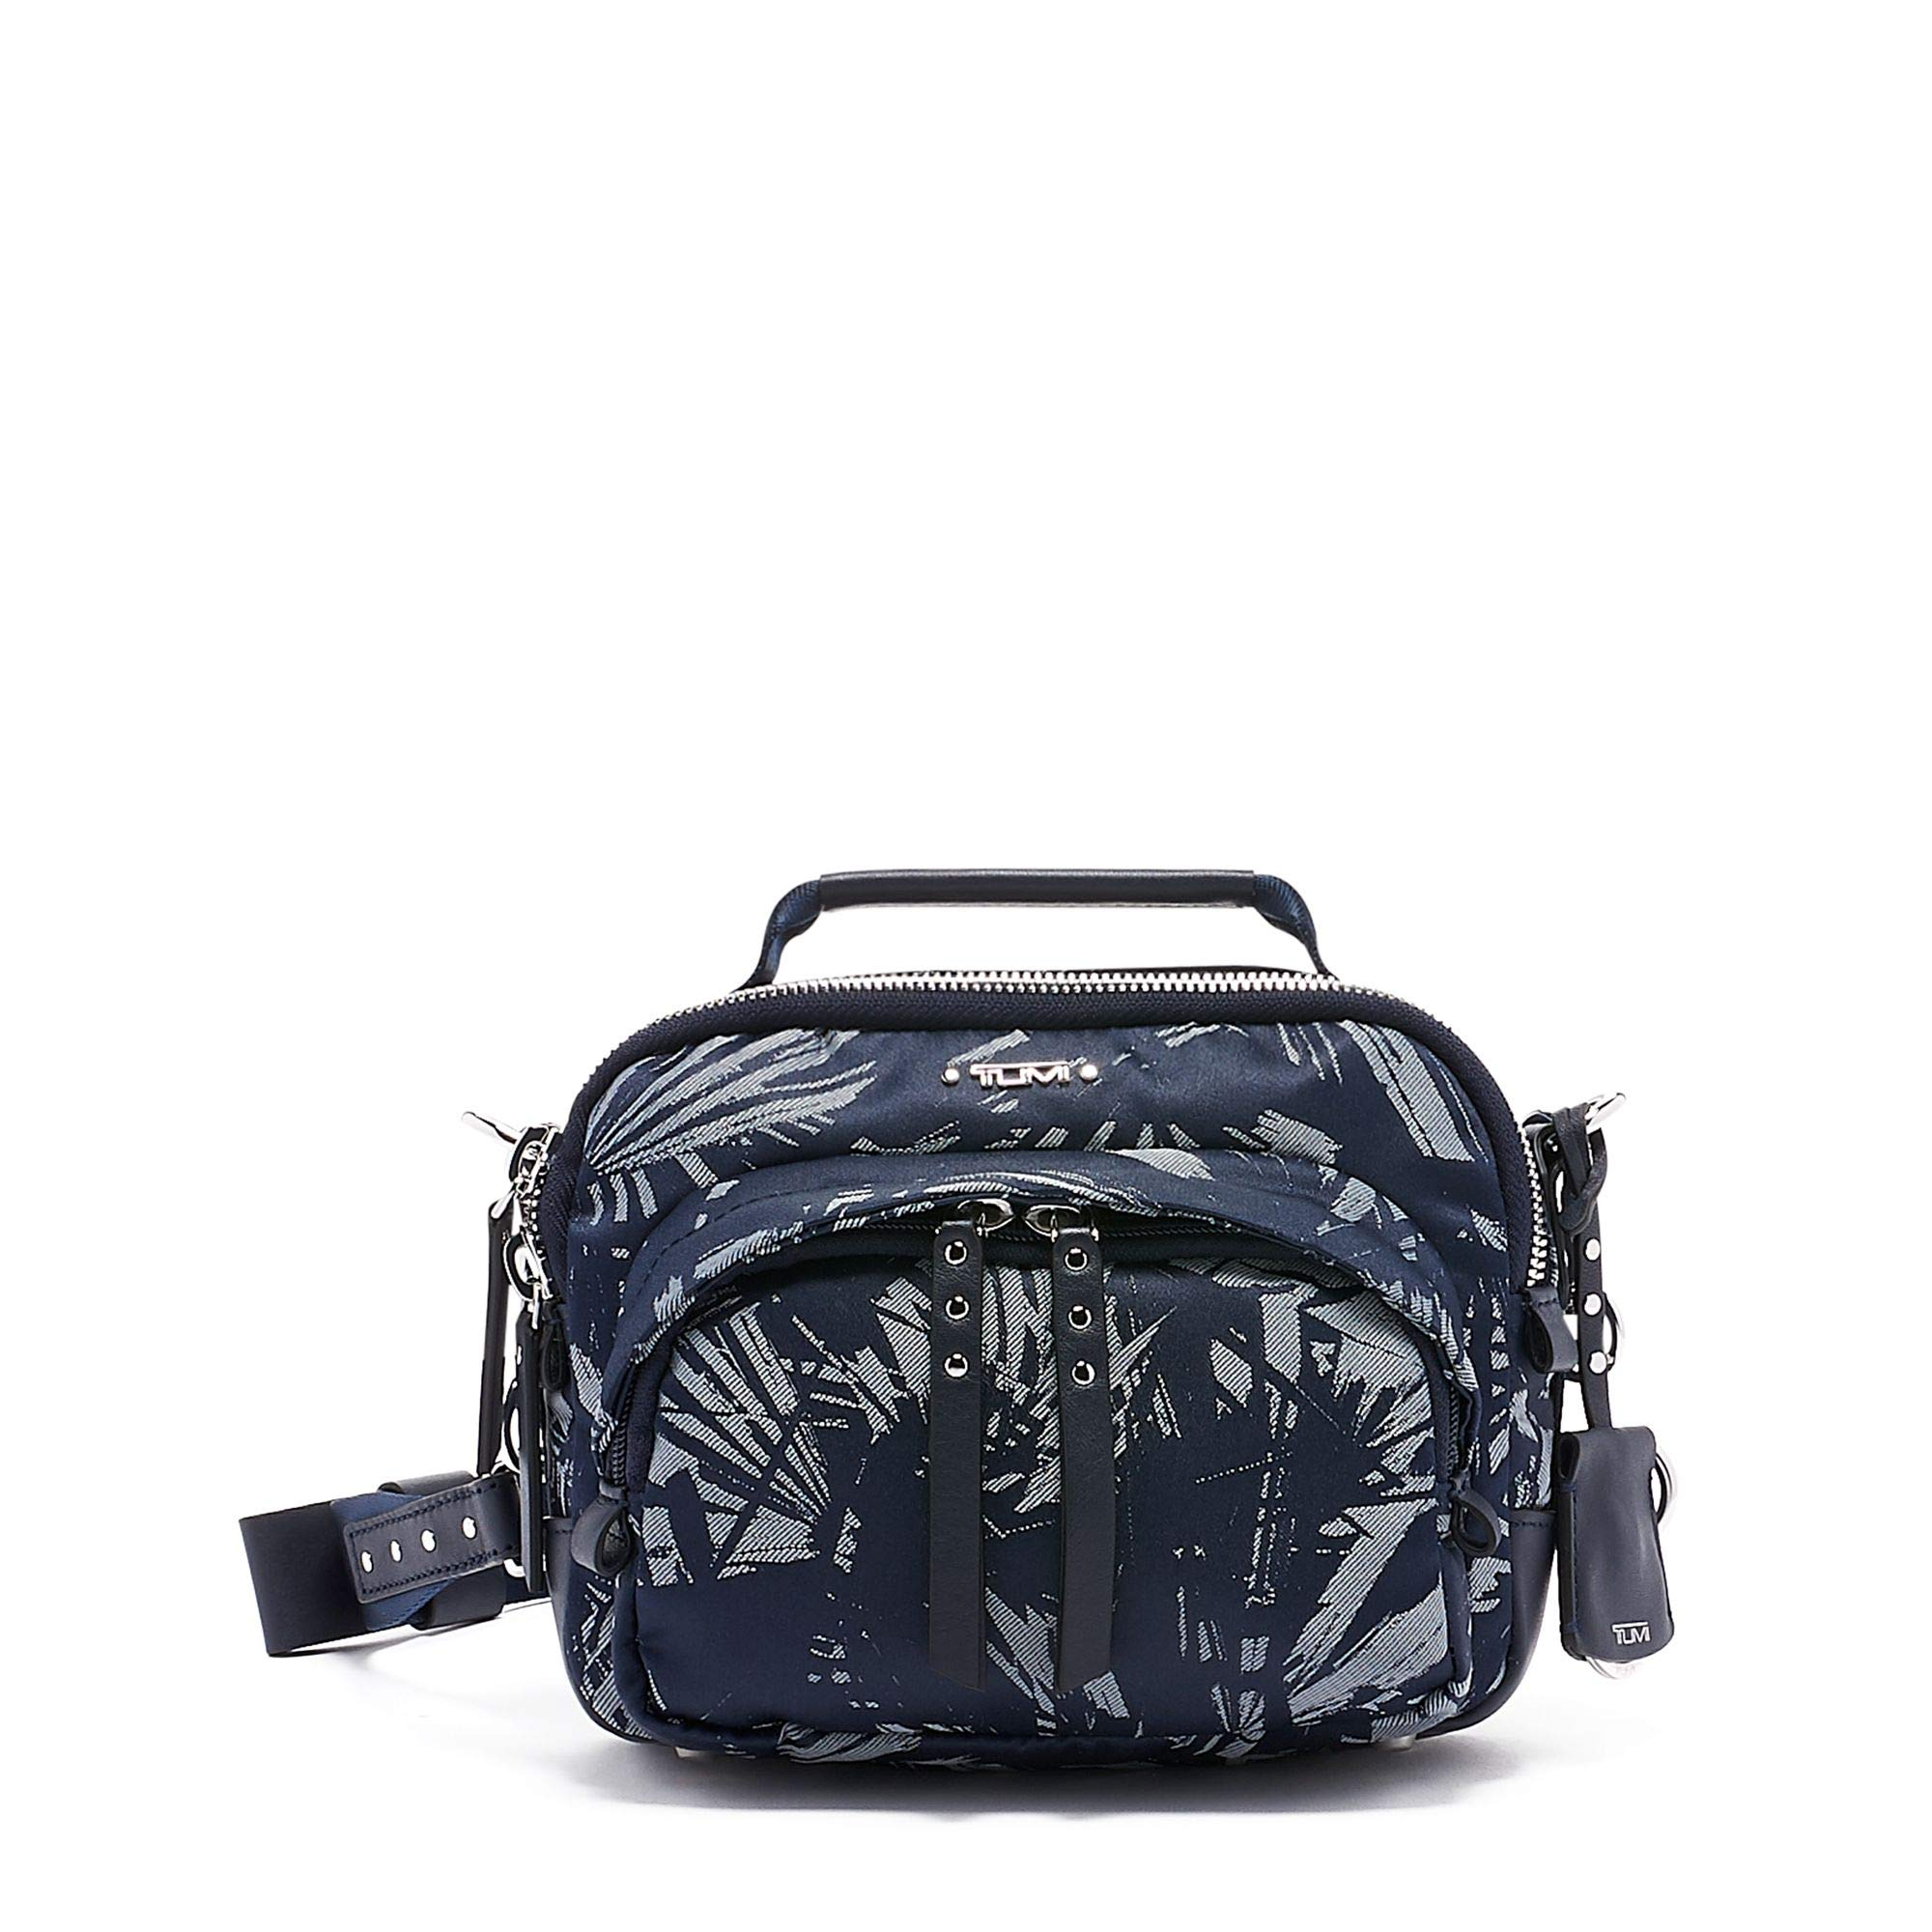 TUMI - Voyageur Troy Crossbody Bag - Over Shoulder Satchel for Women - Blue Palm Print